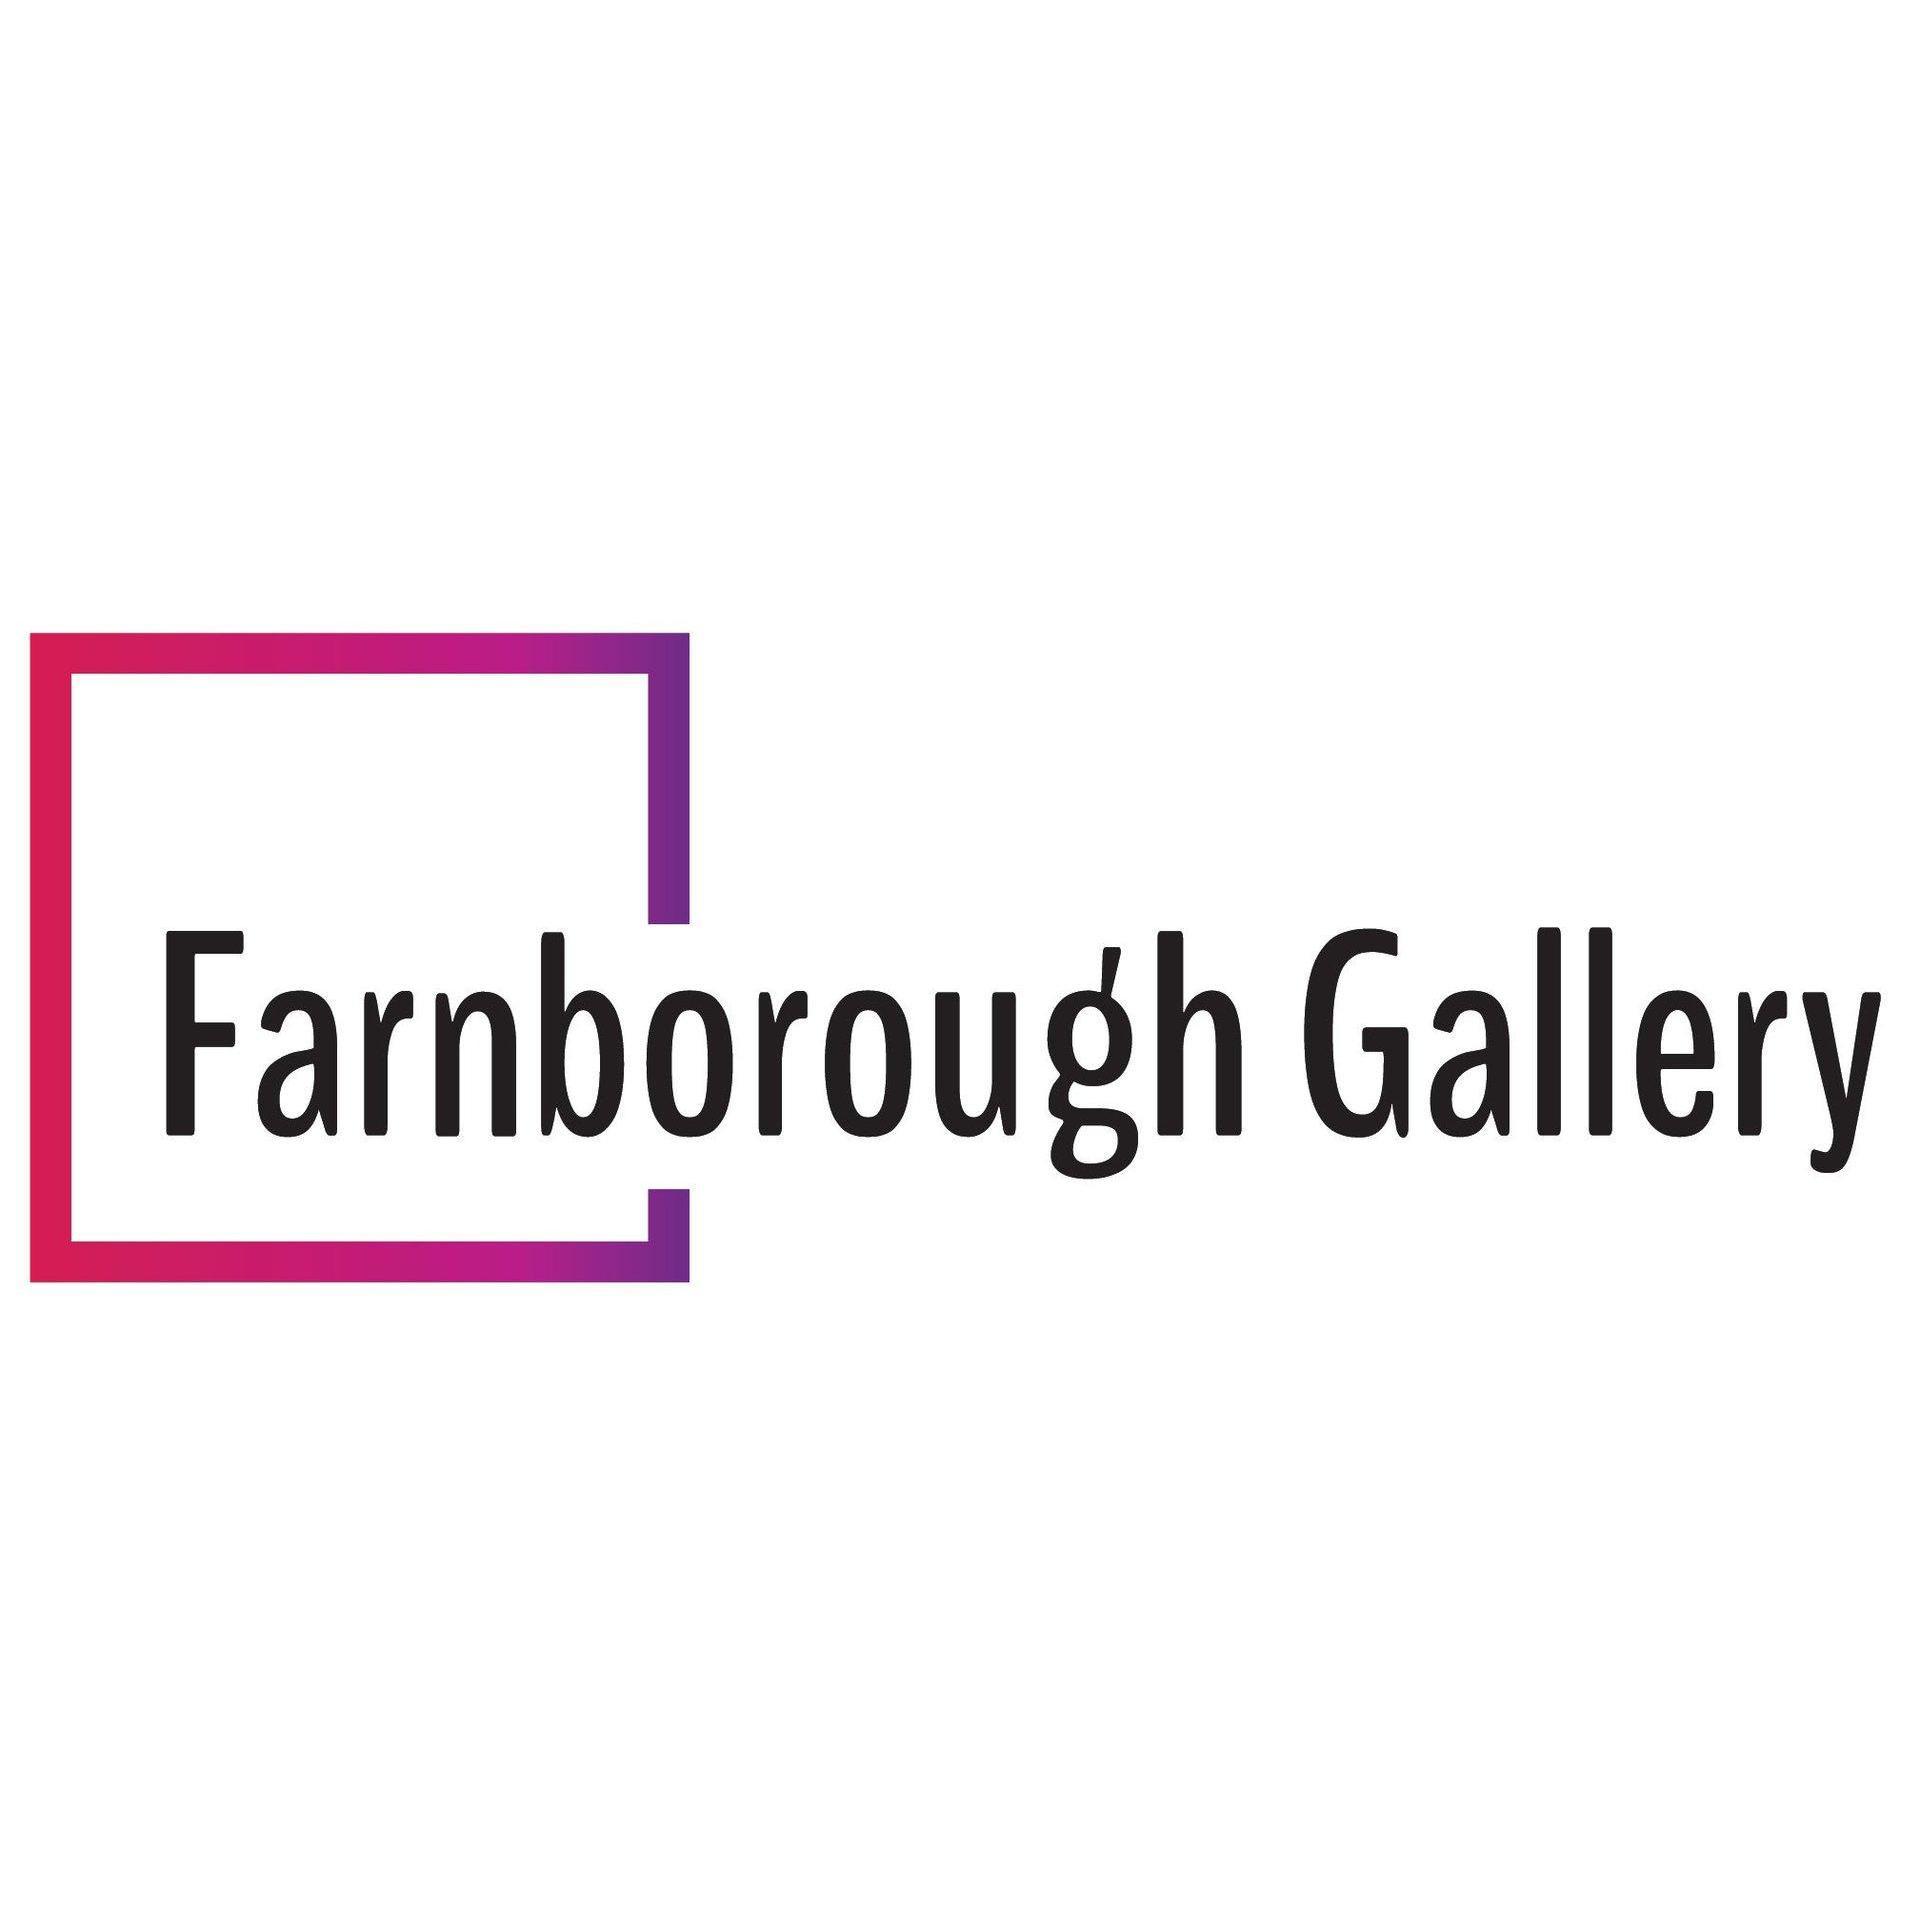 Farnborough Gallery - Farnborough, Hampshire GU14 6PU - 01252 518033 | ShowMeLocal.com